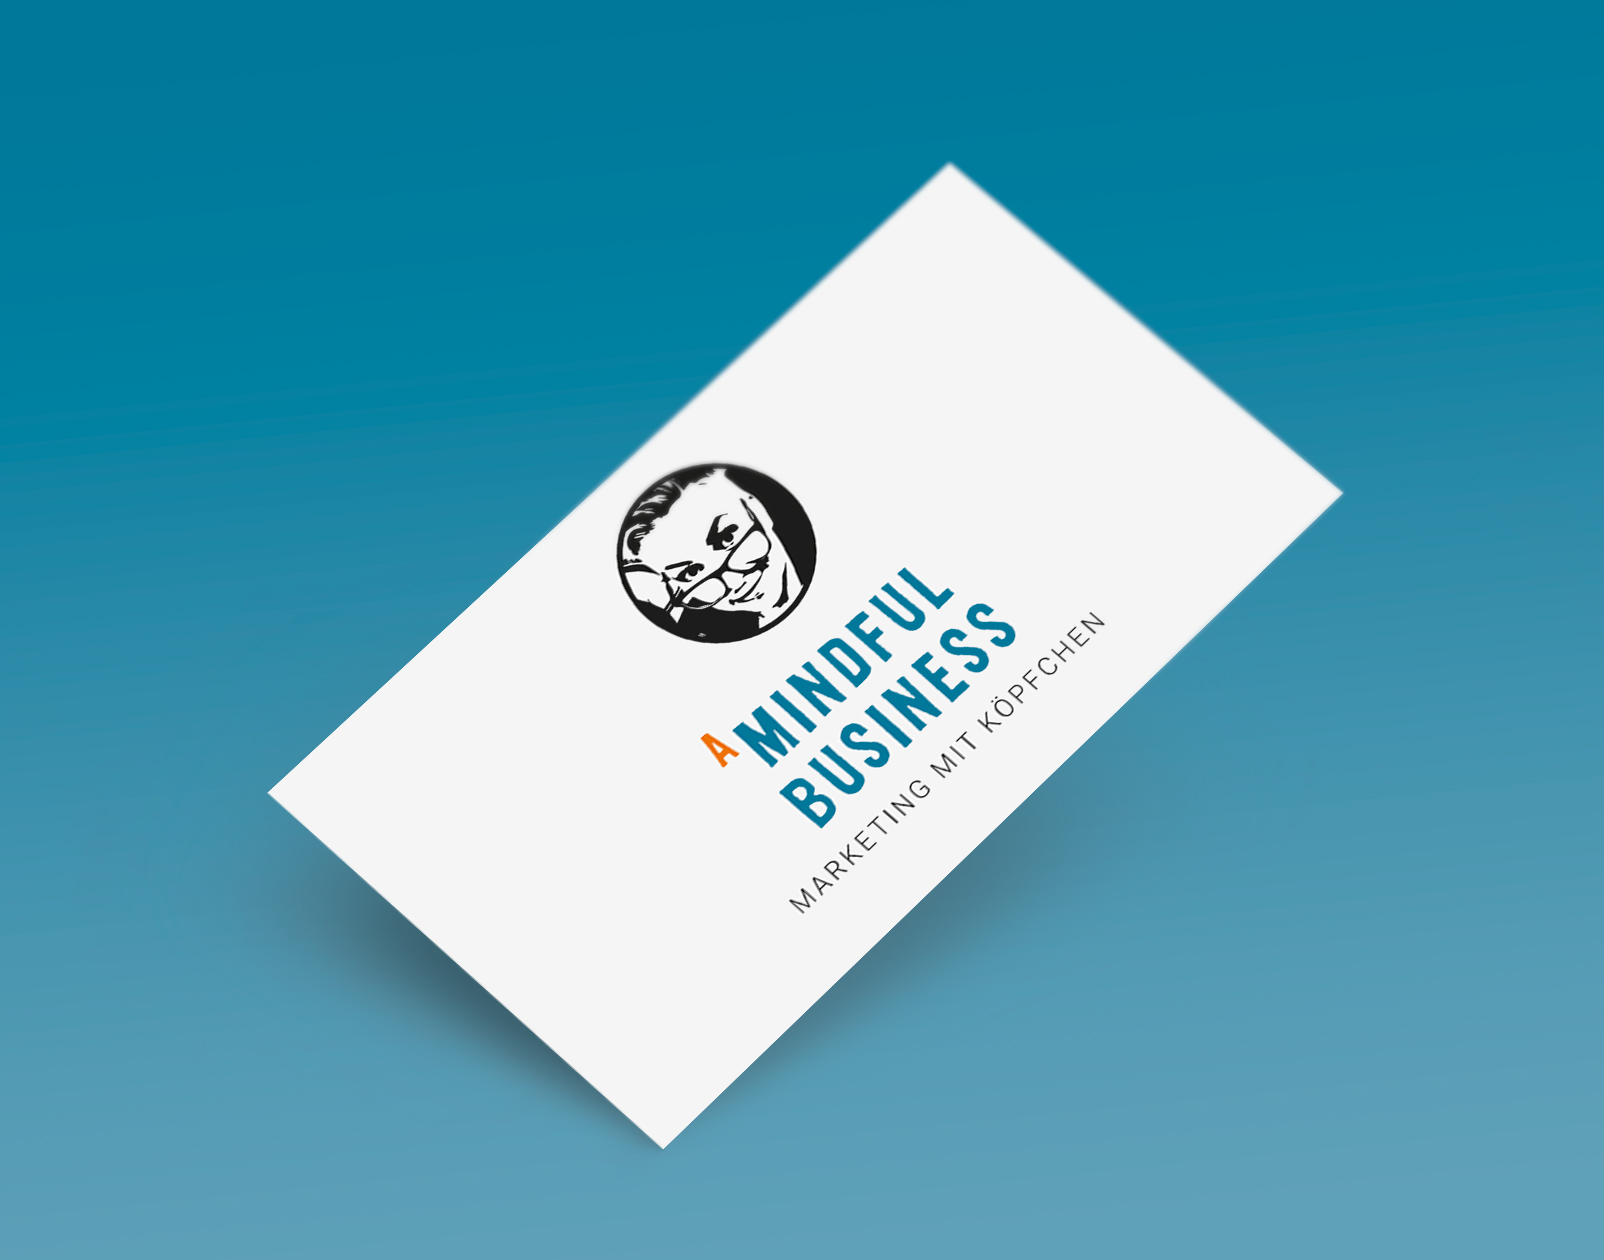 MindfulBusiness_Card.jpg